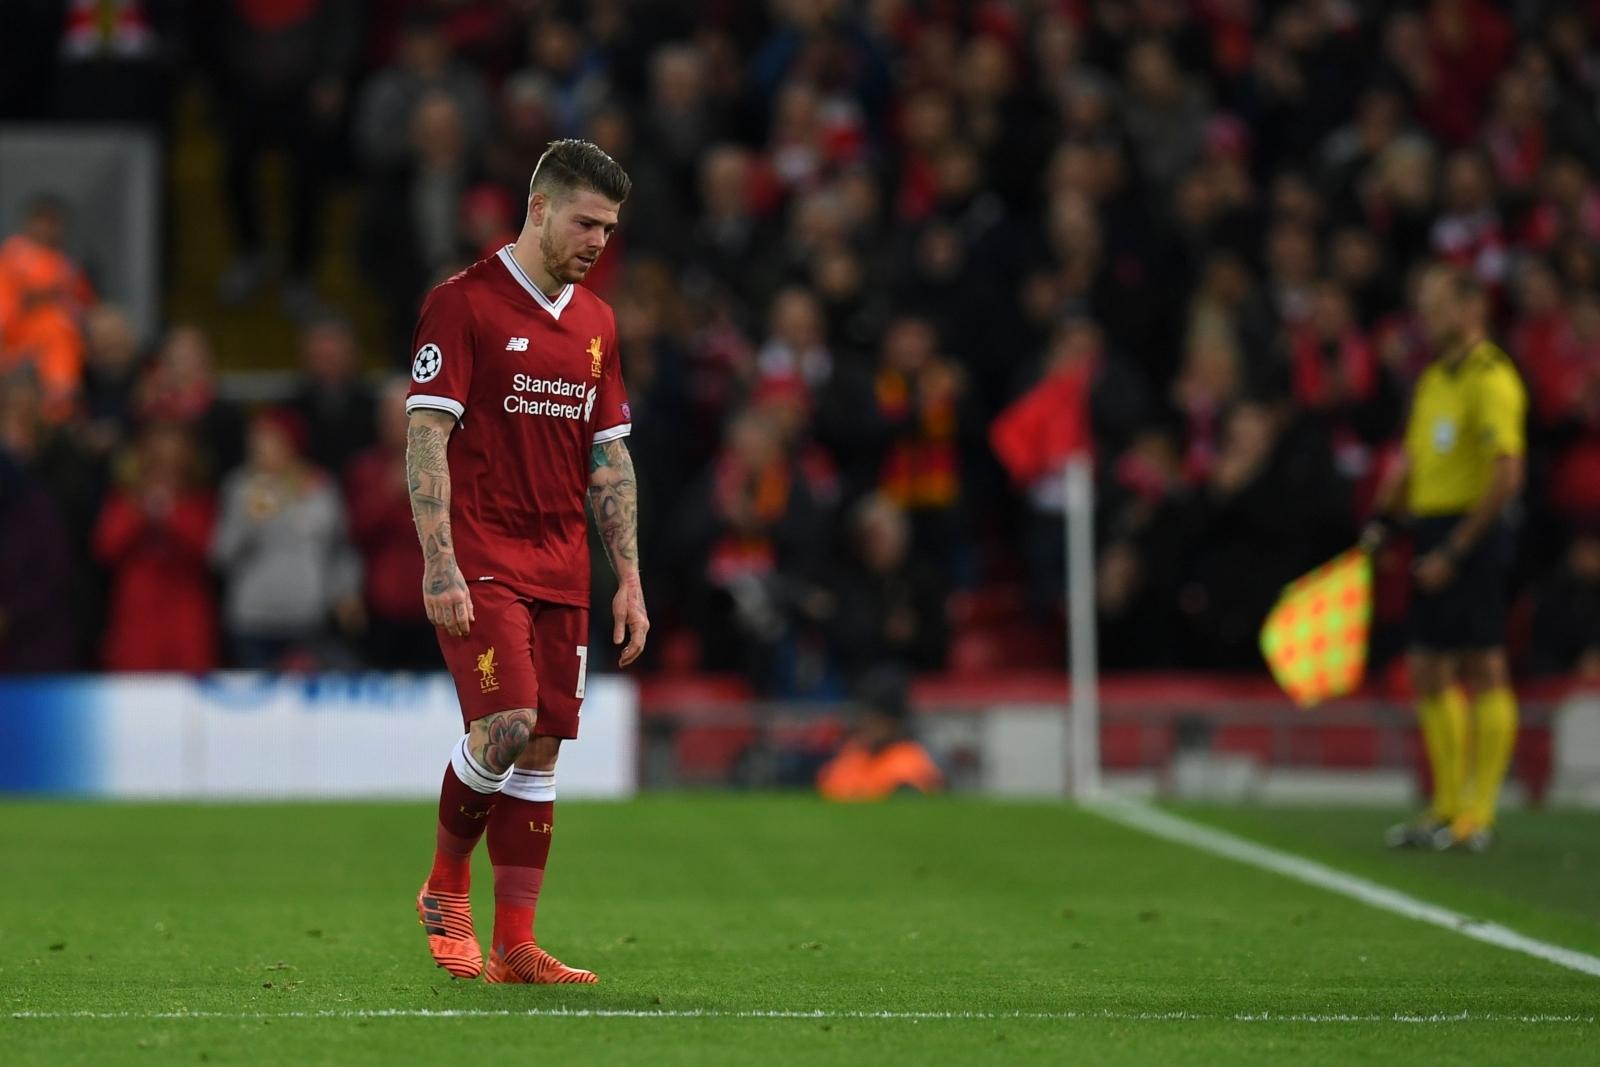 Henderson has 'hardest job in football' as Liverpool skipper